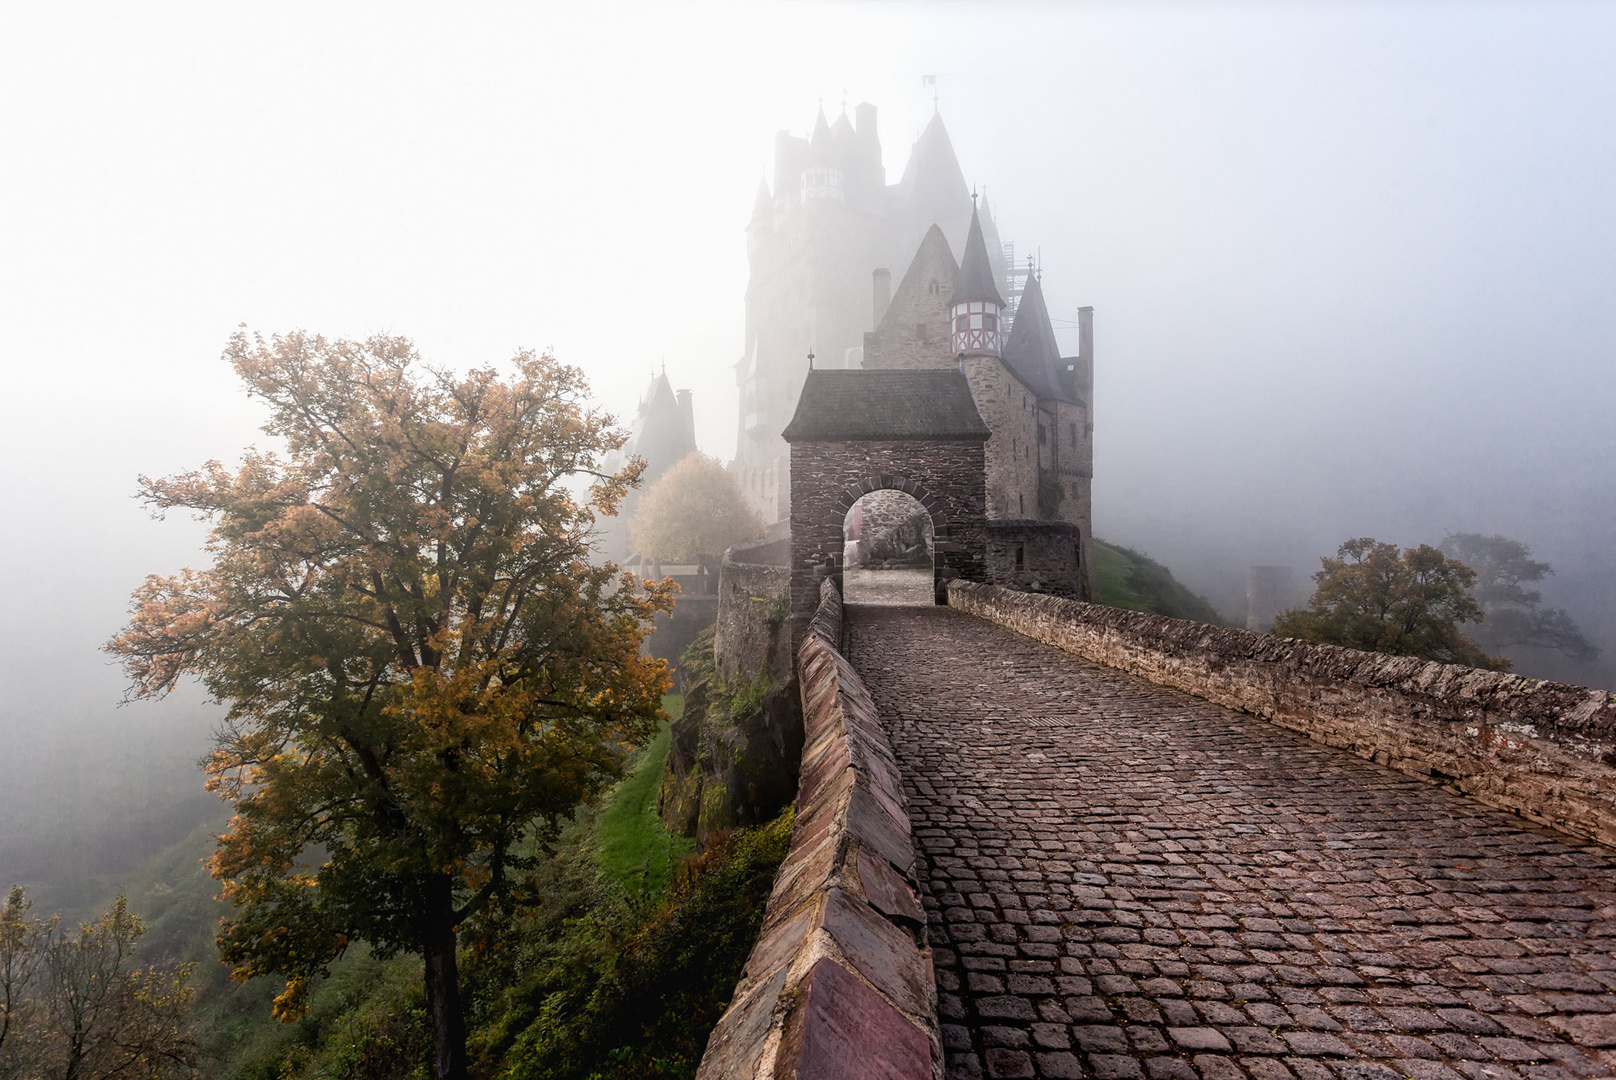 Misty scene at Burg Eltz